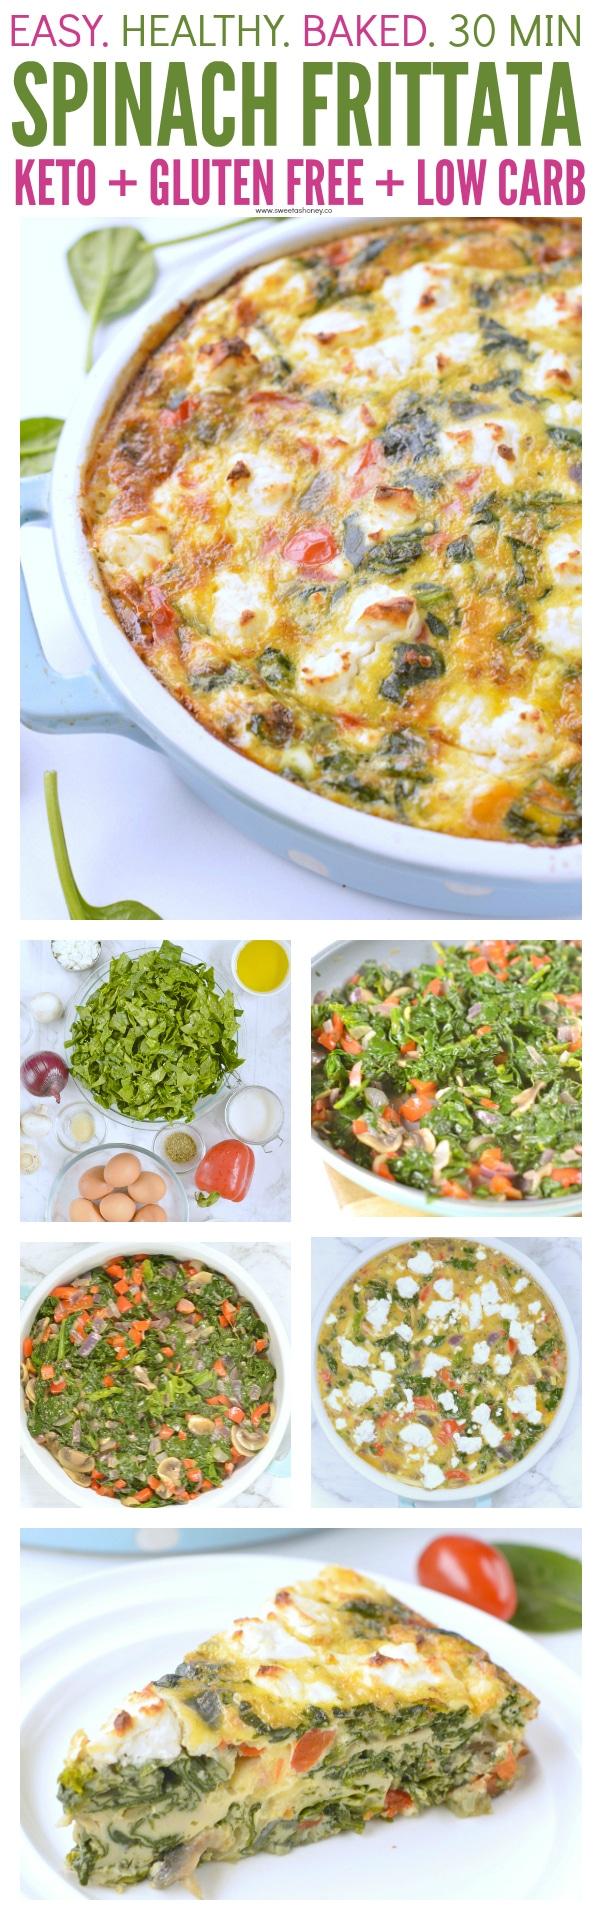 spinach frittata feta